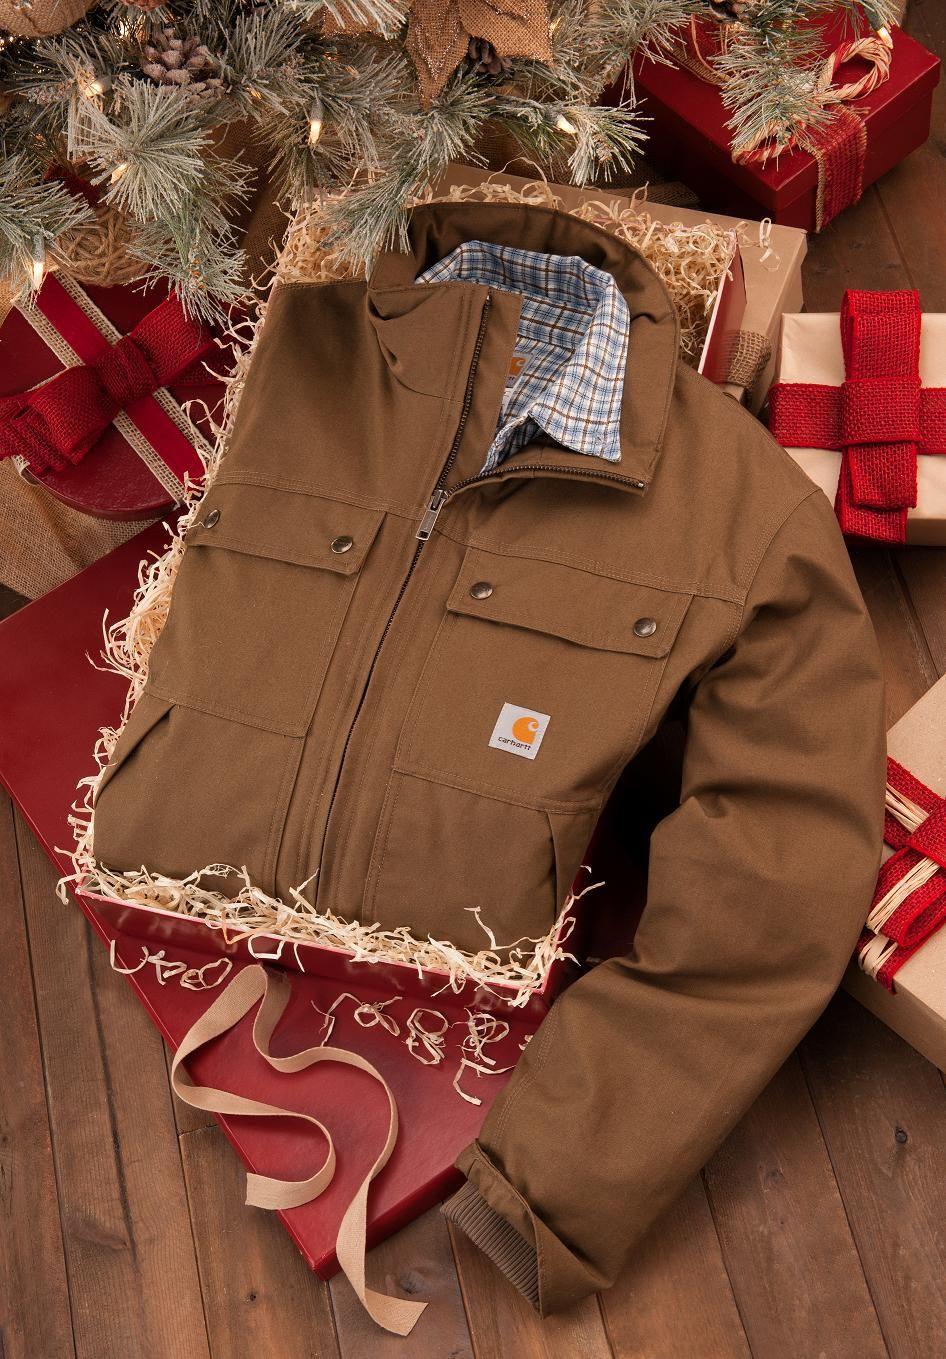 Carhartt Men S Jackets From Academy Sports Outdoors Carhartt Mens Jacket Jackets Mens Jackets [ 1359 x 946 Pixel ]